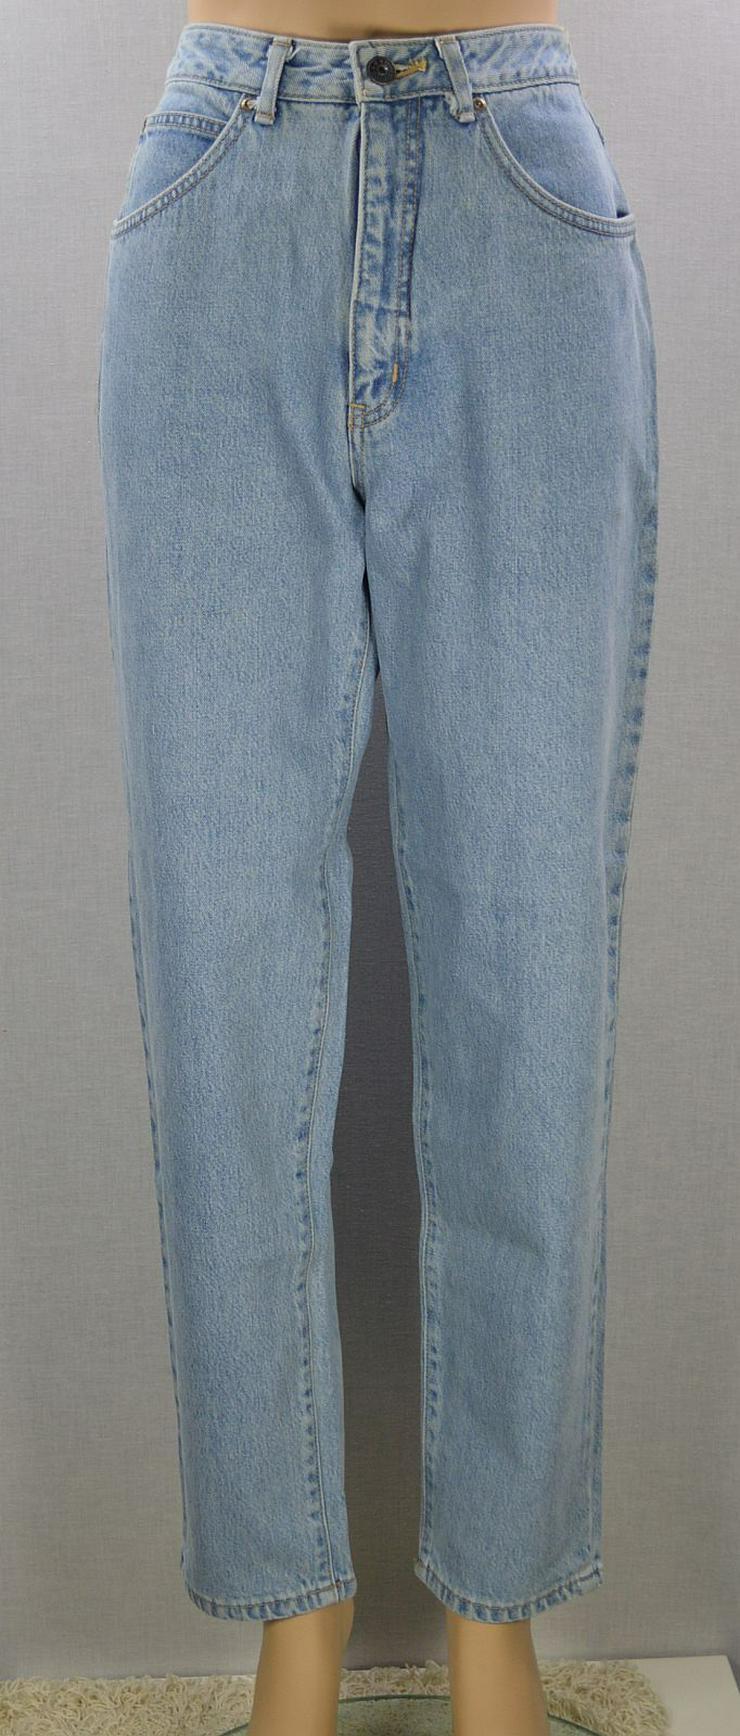 Something Edwin Jeans Hose W32L28 nur für Selbstabholer! 2-1295